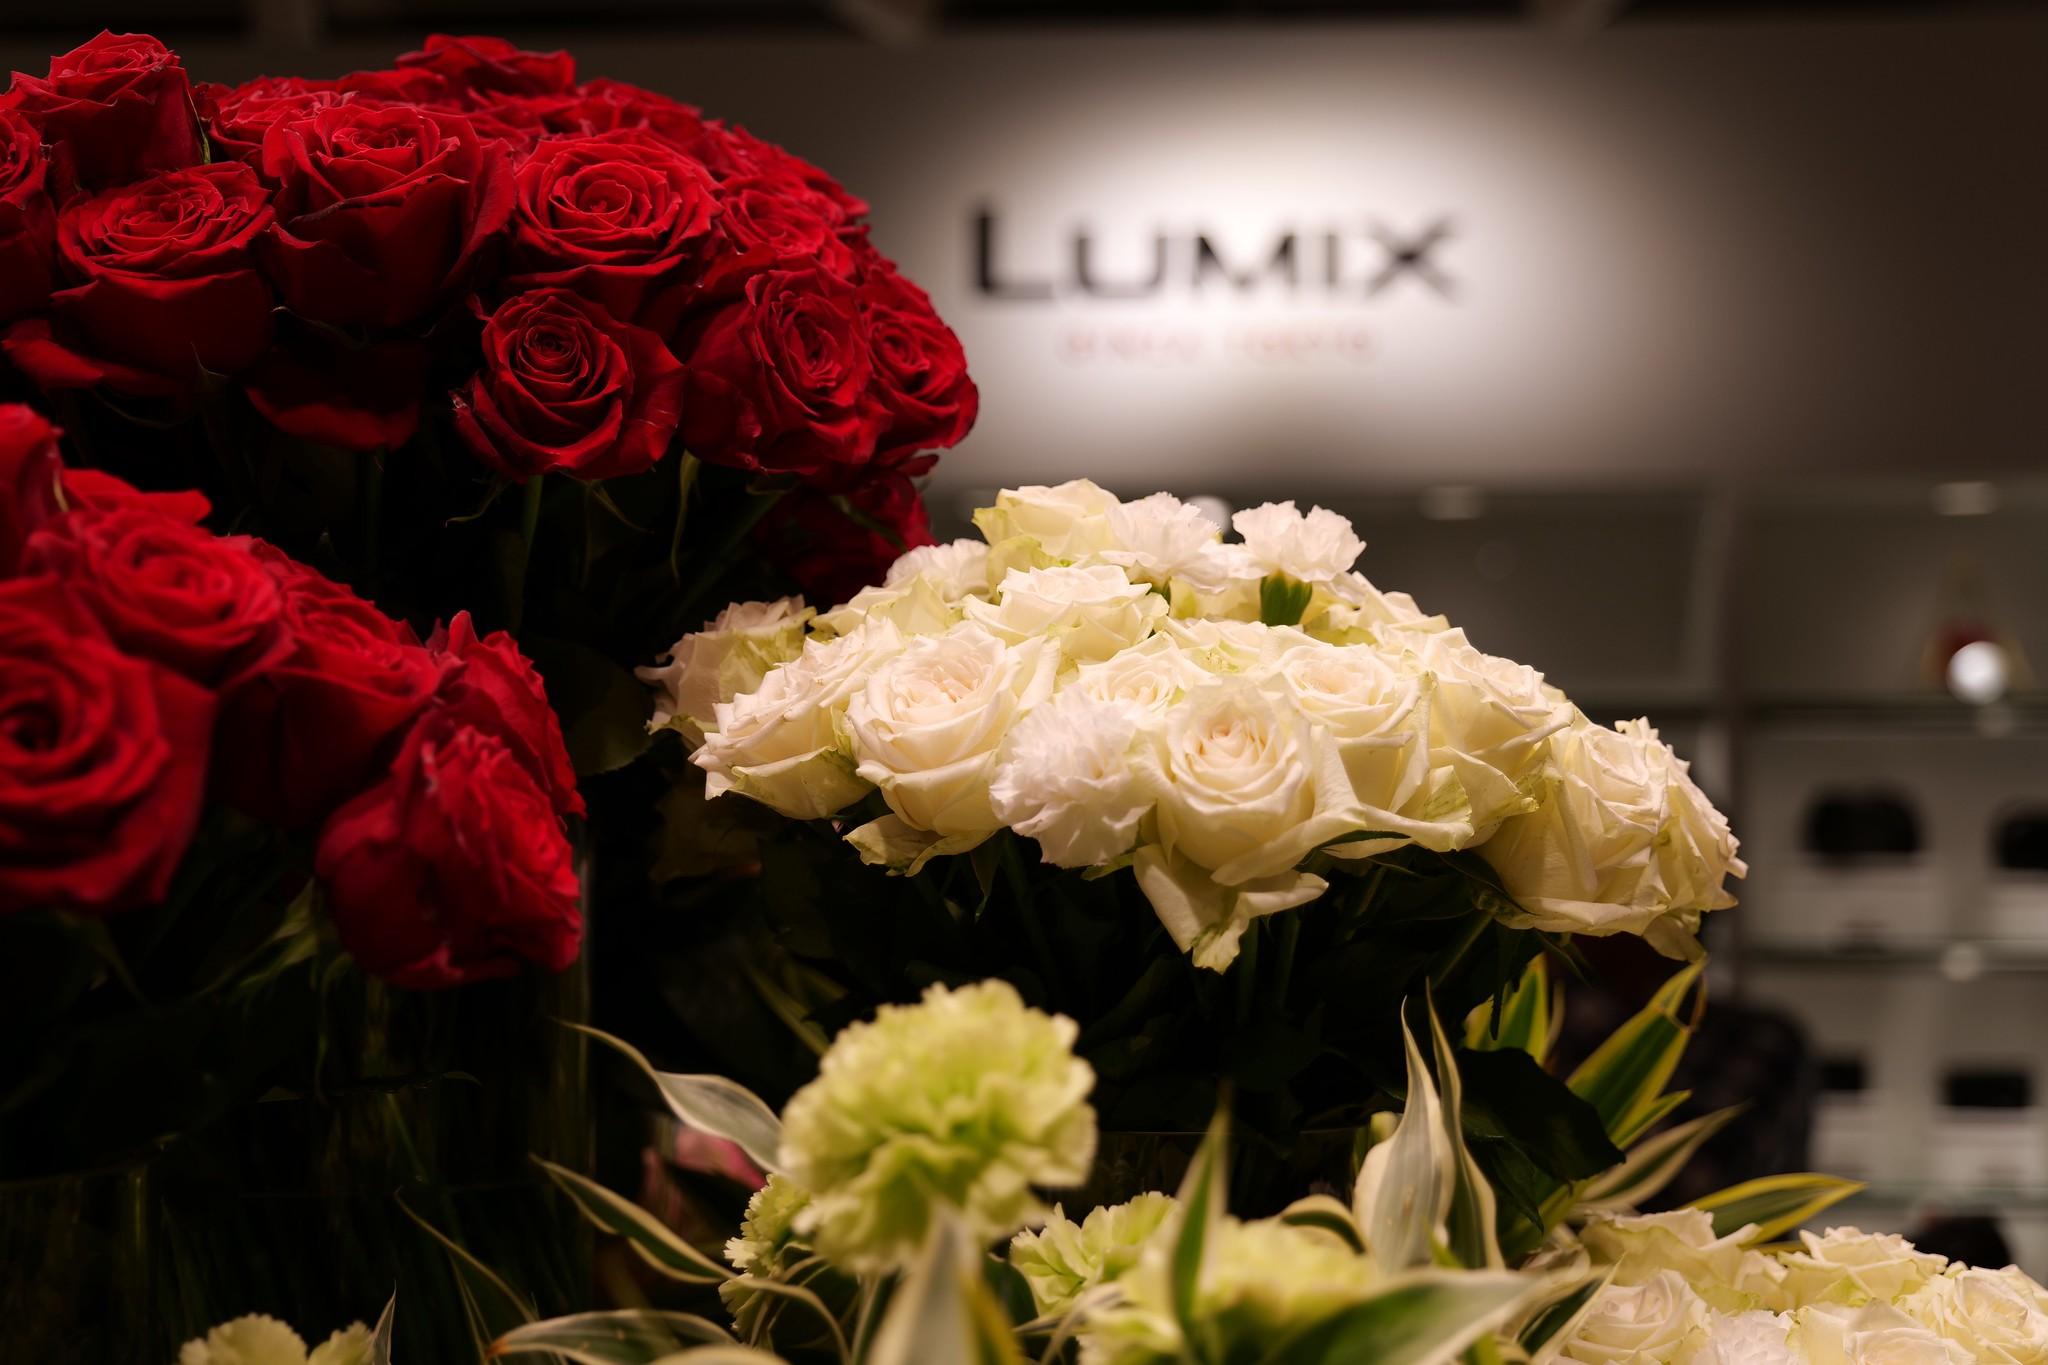 Panasonic LUMIX S1  24-105